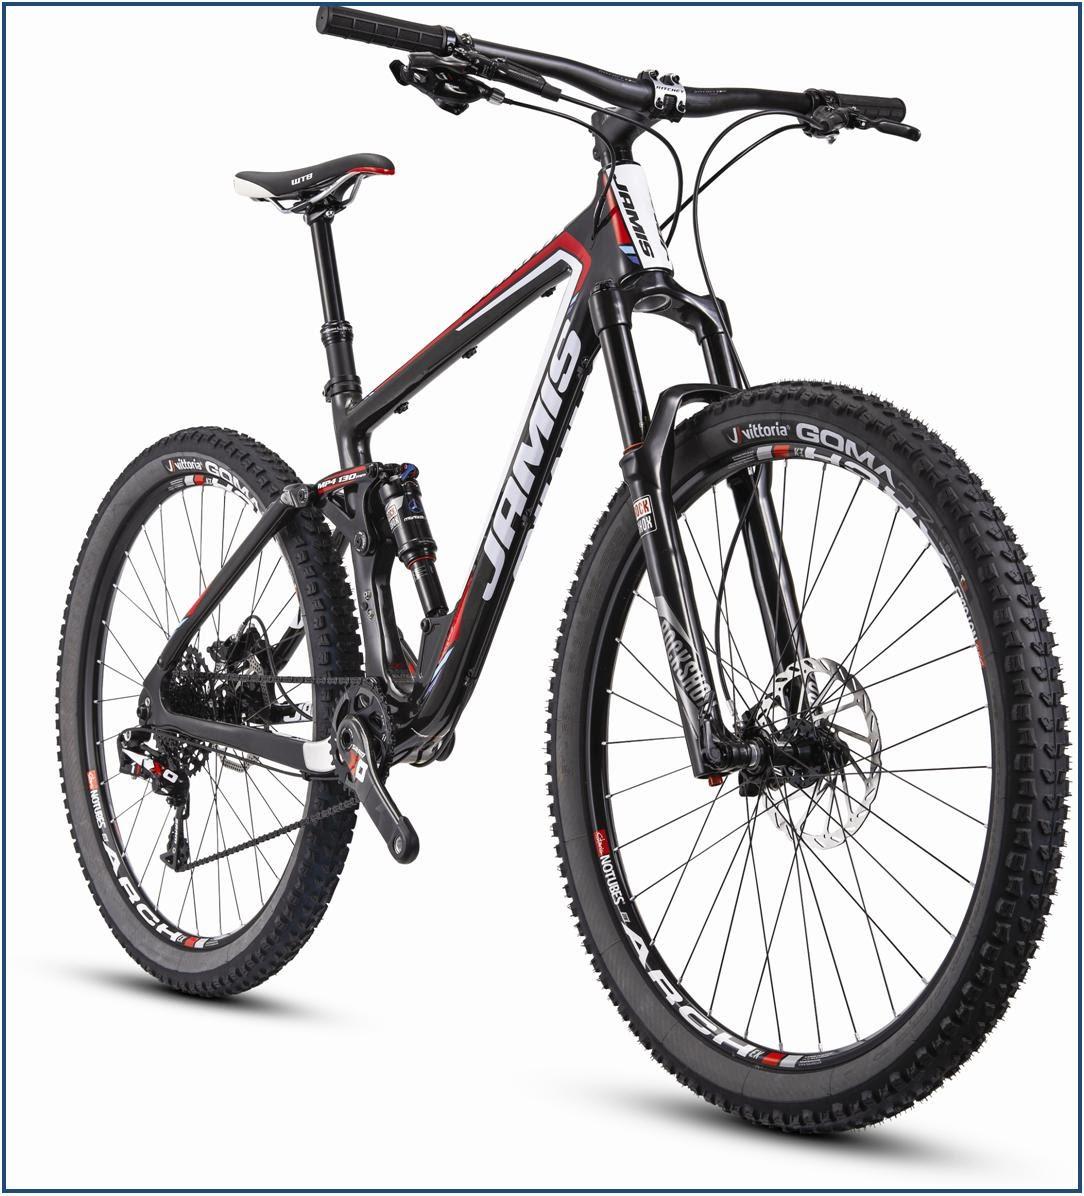 jamis dakar xct team mountain bike XC trail geo